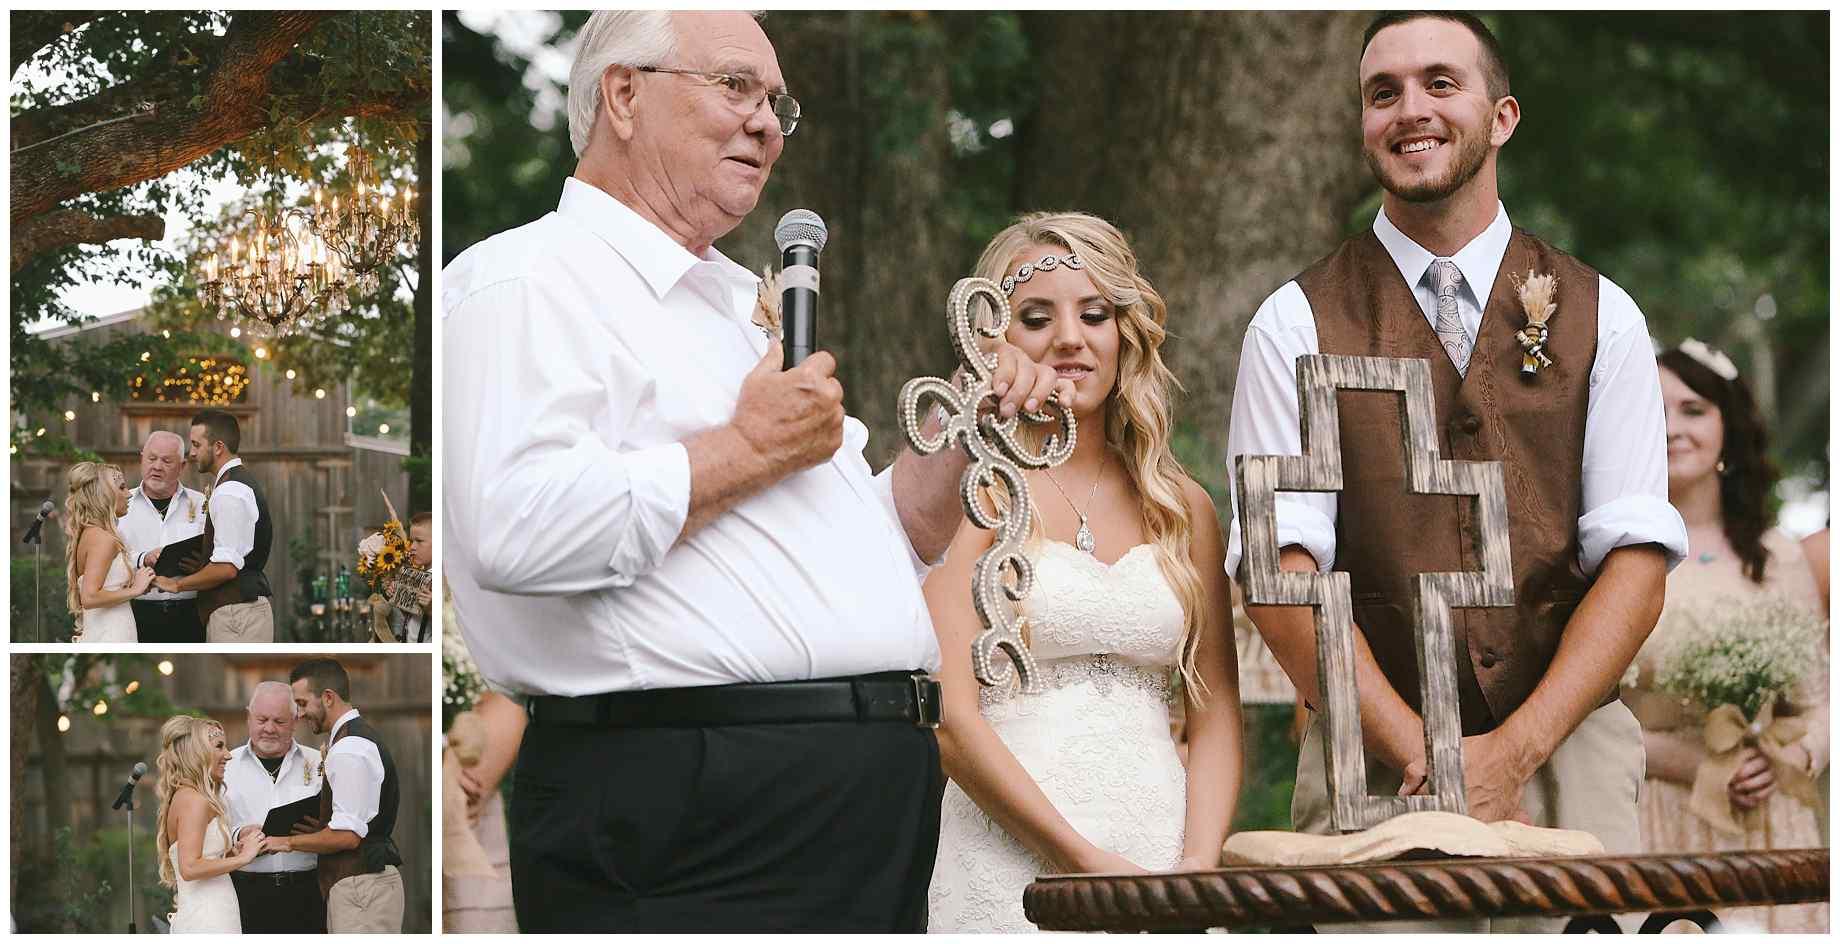 stone-oak-ranch-outdoor-wedding-019